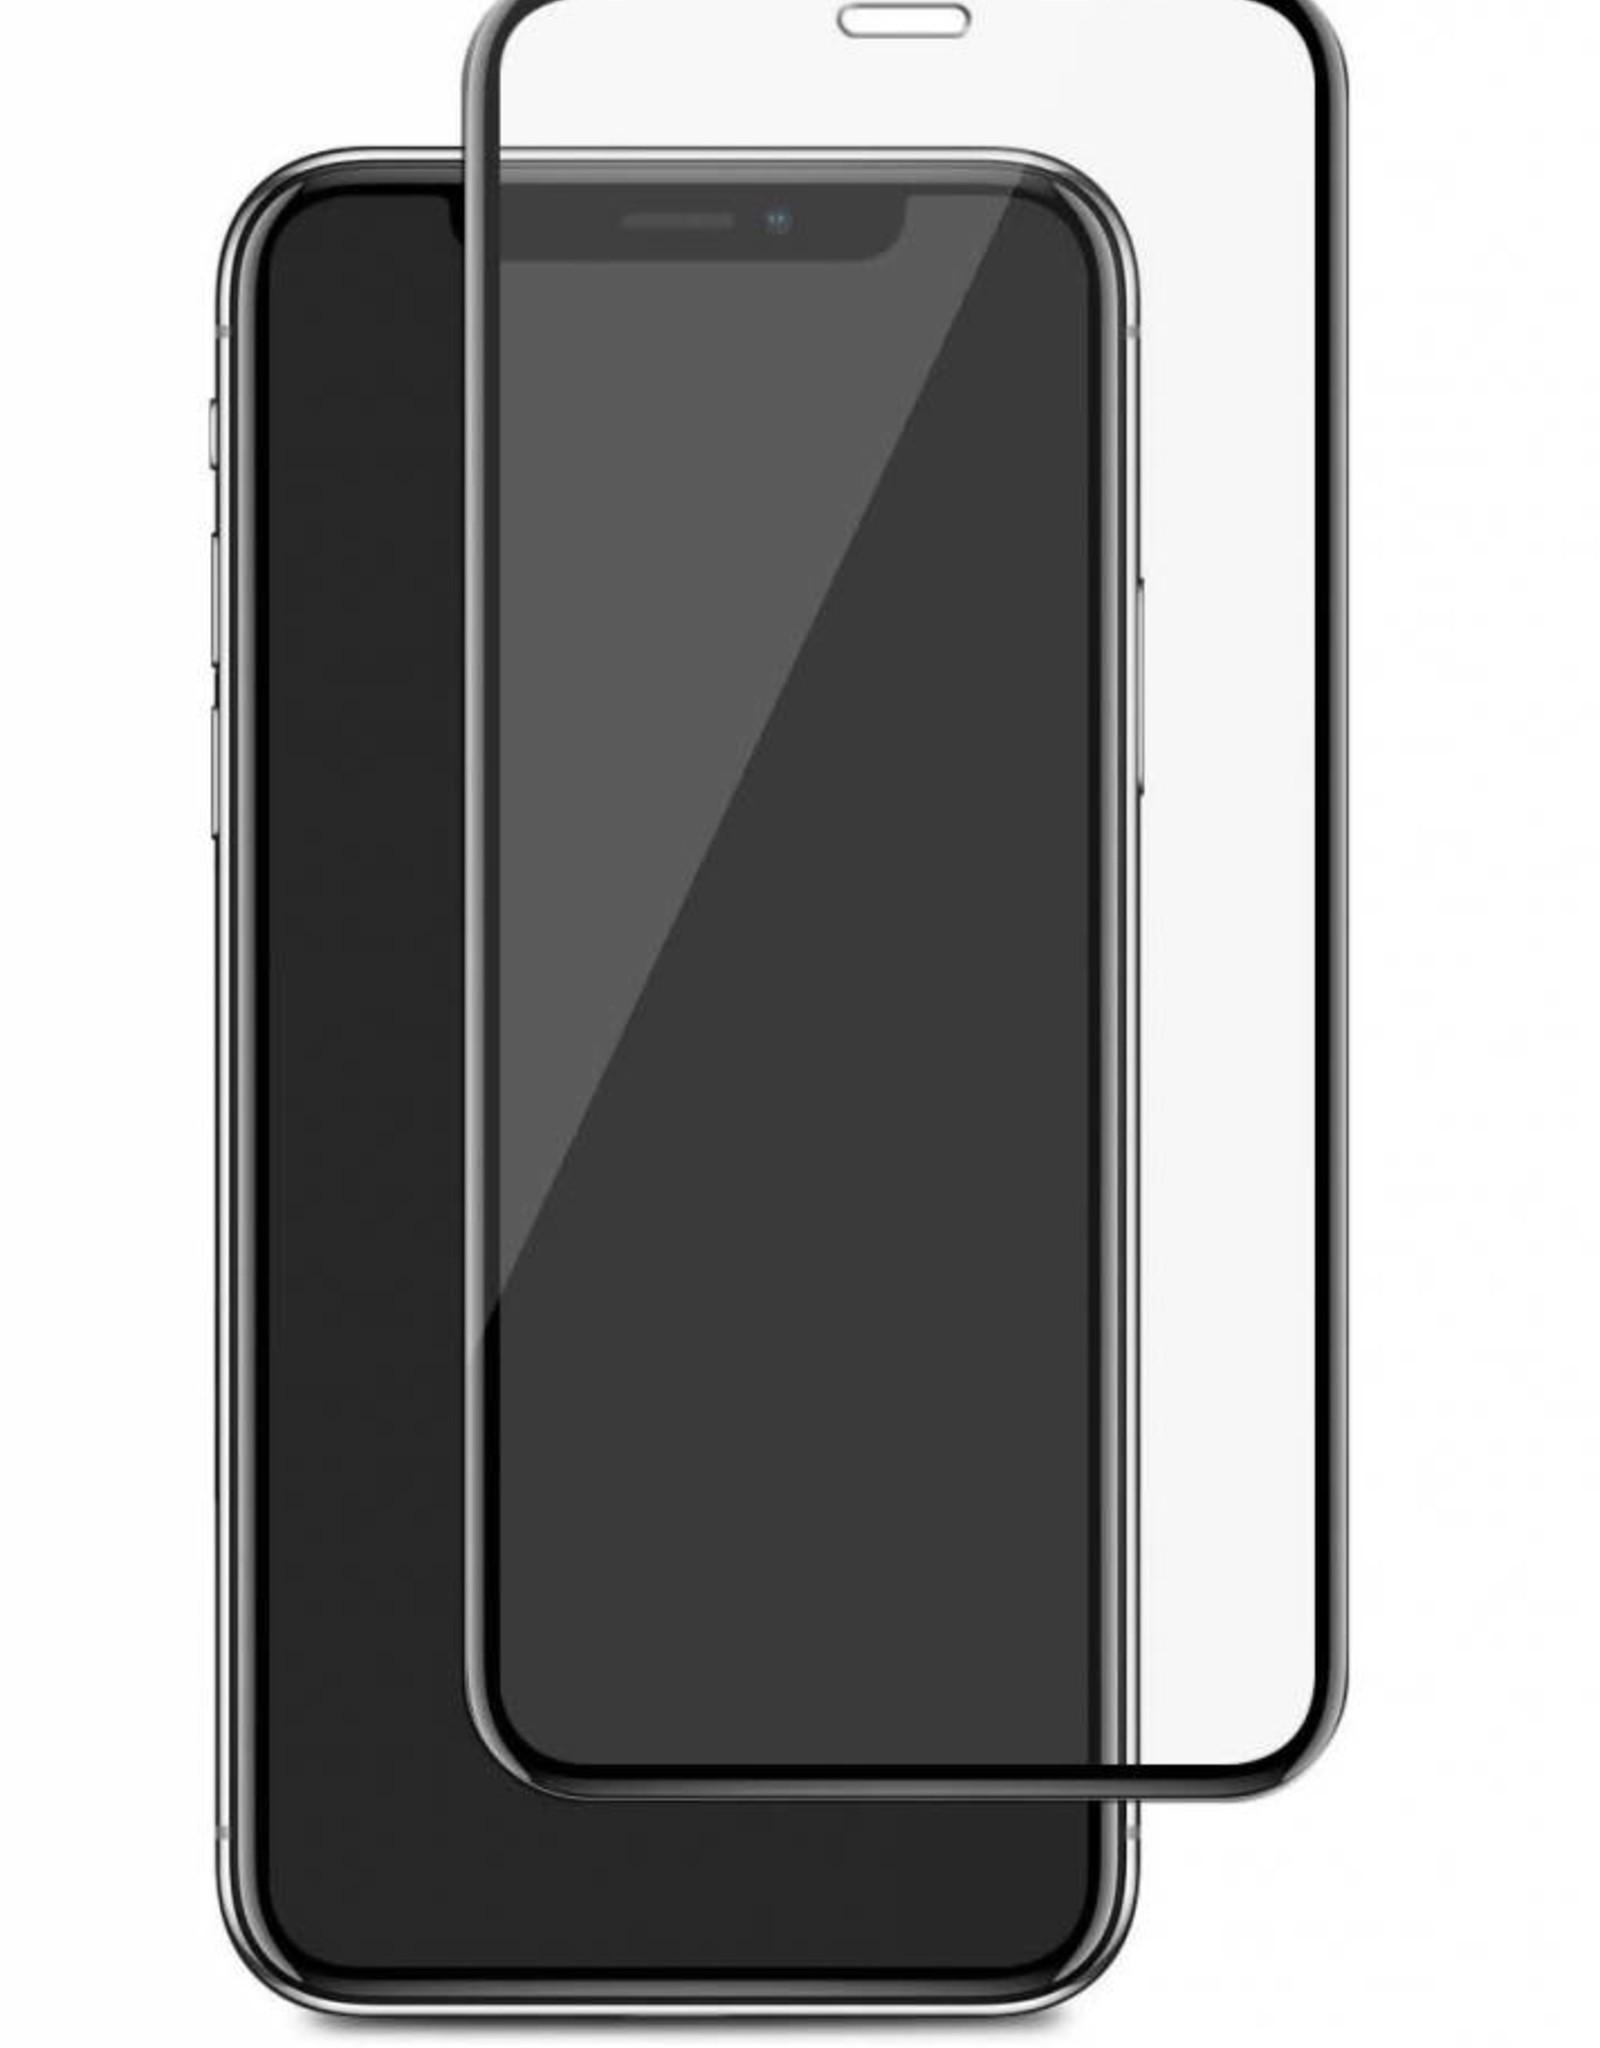 Blu Element Blu Element | iPhone Xs Max / Pro Max 3D Curved Glass Screen Protector | 118-2033